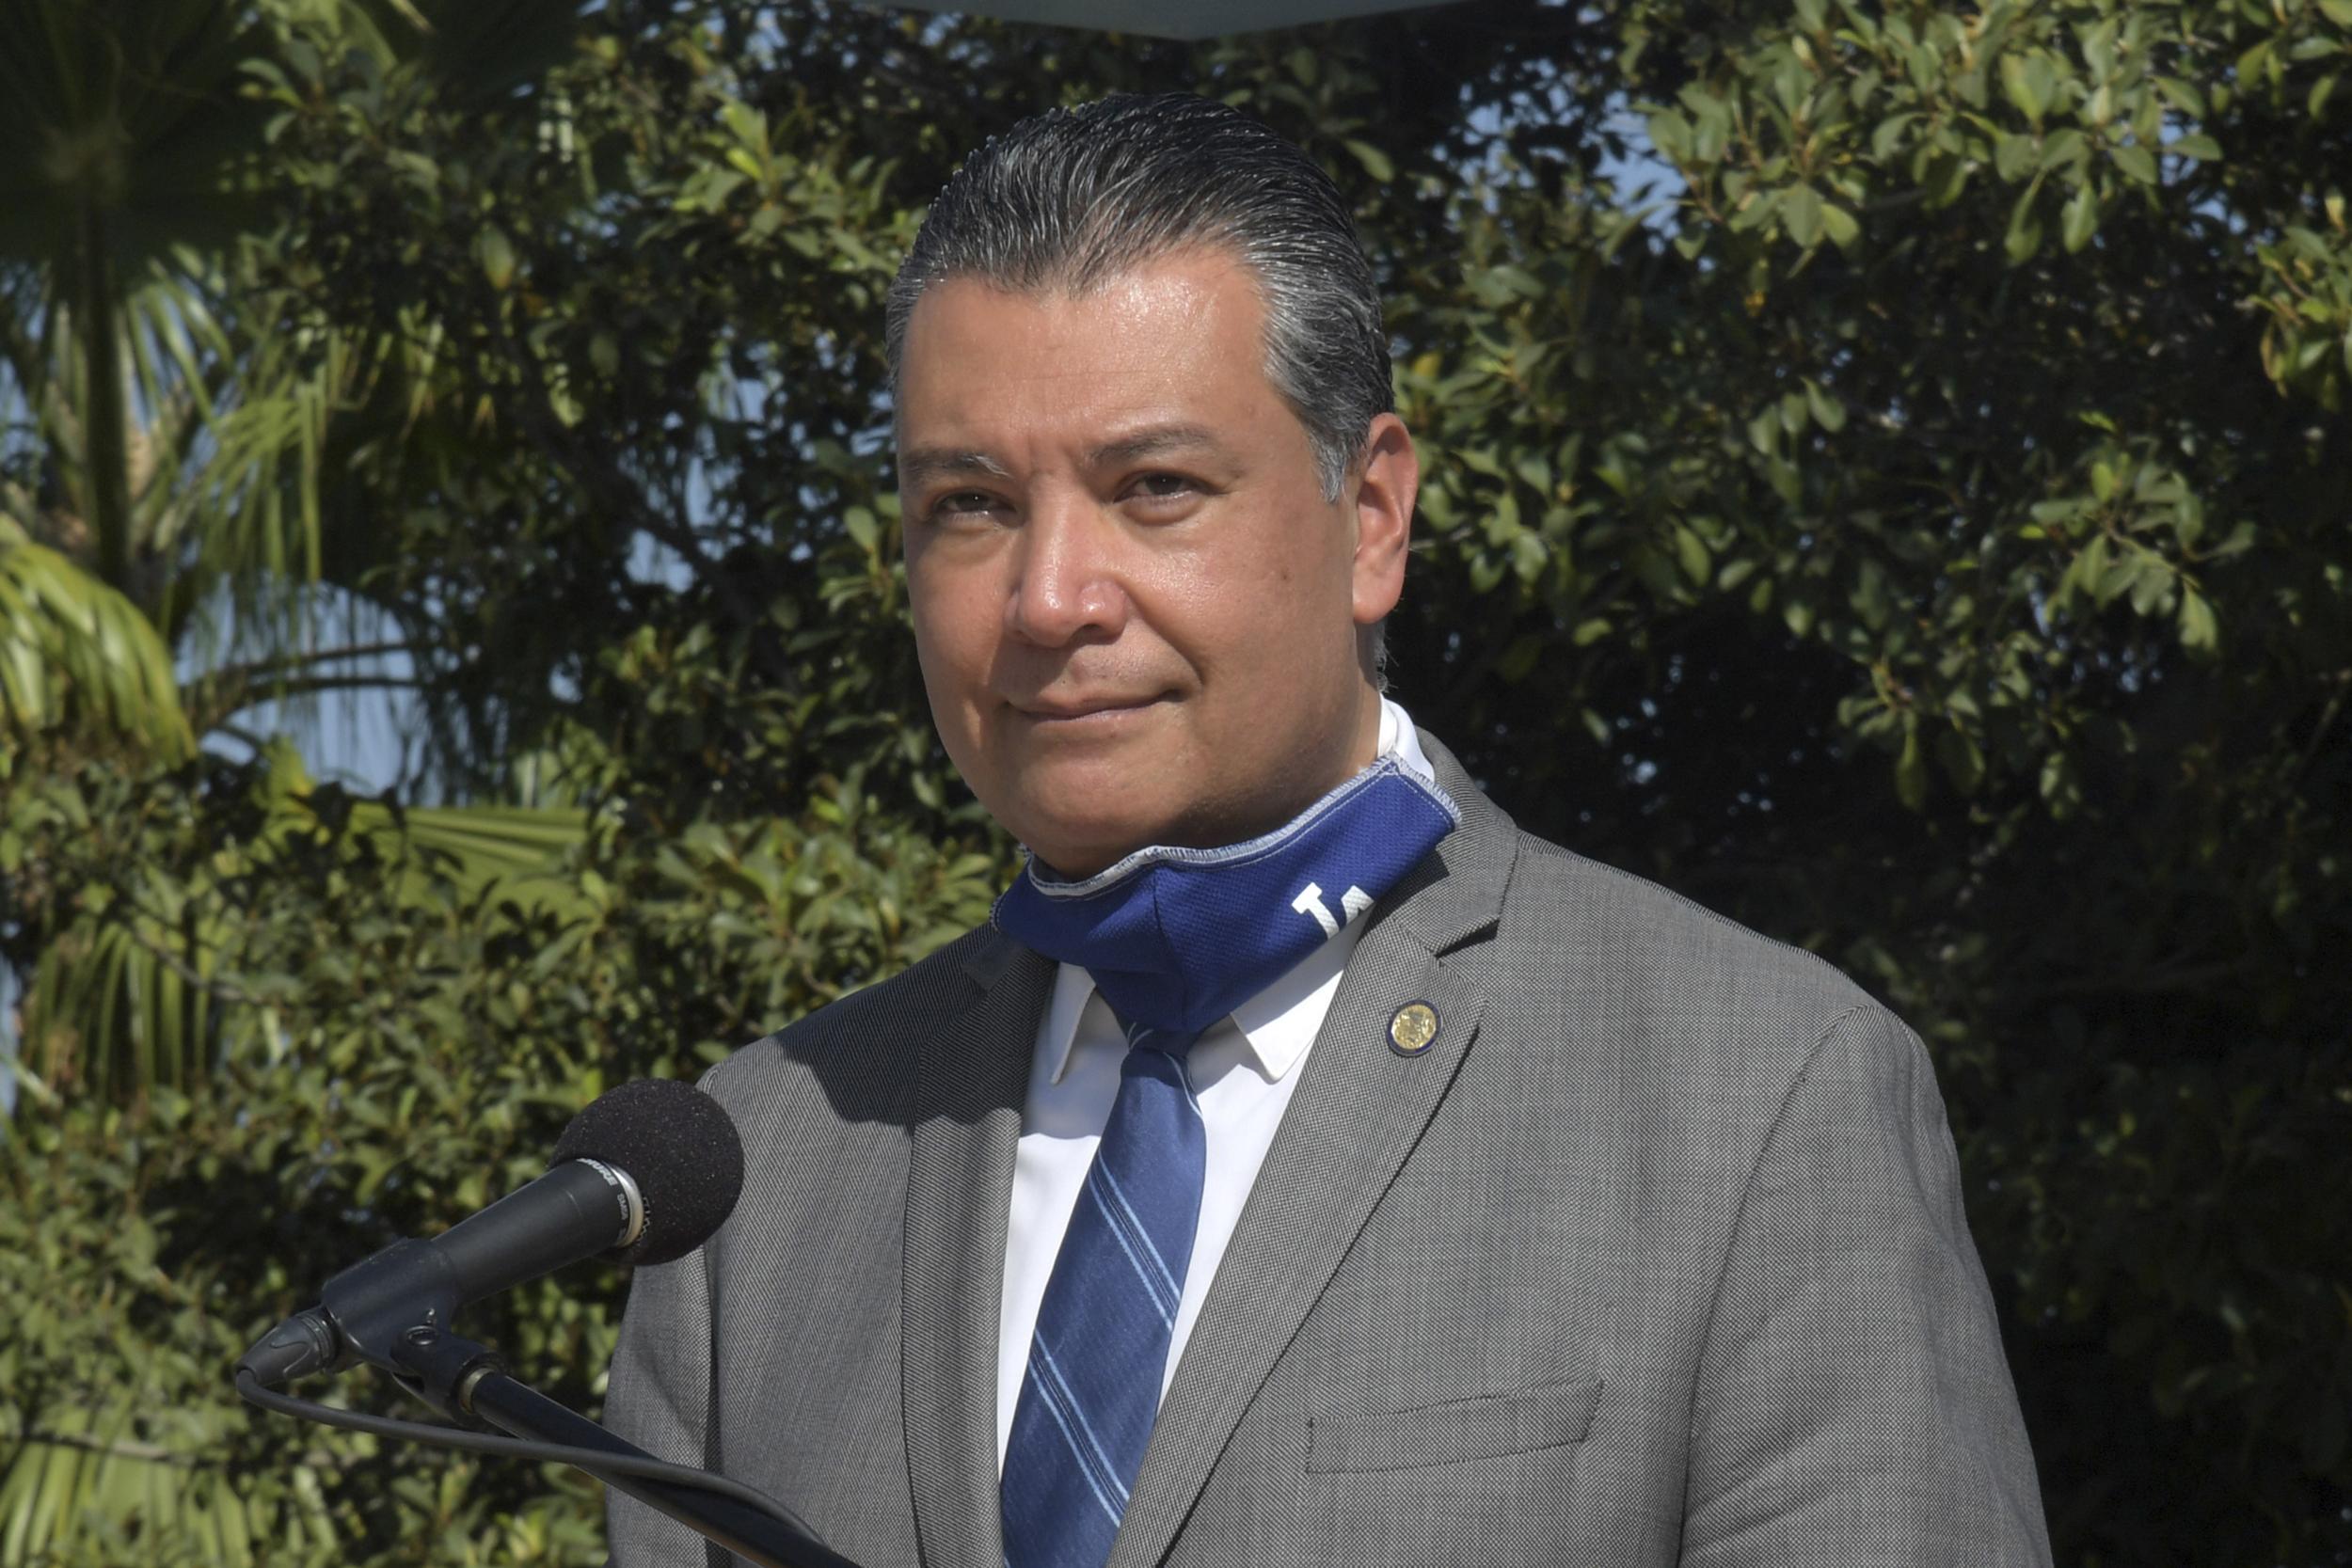 Gov. Newsom picks Alex Padilla to replace Kamala Harris as California senator